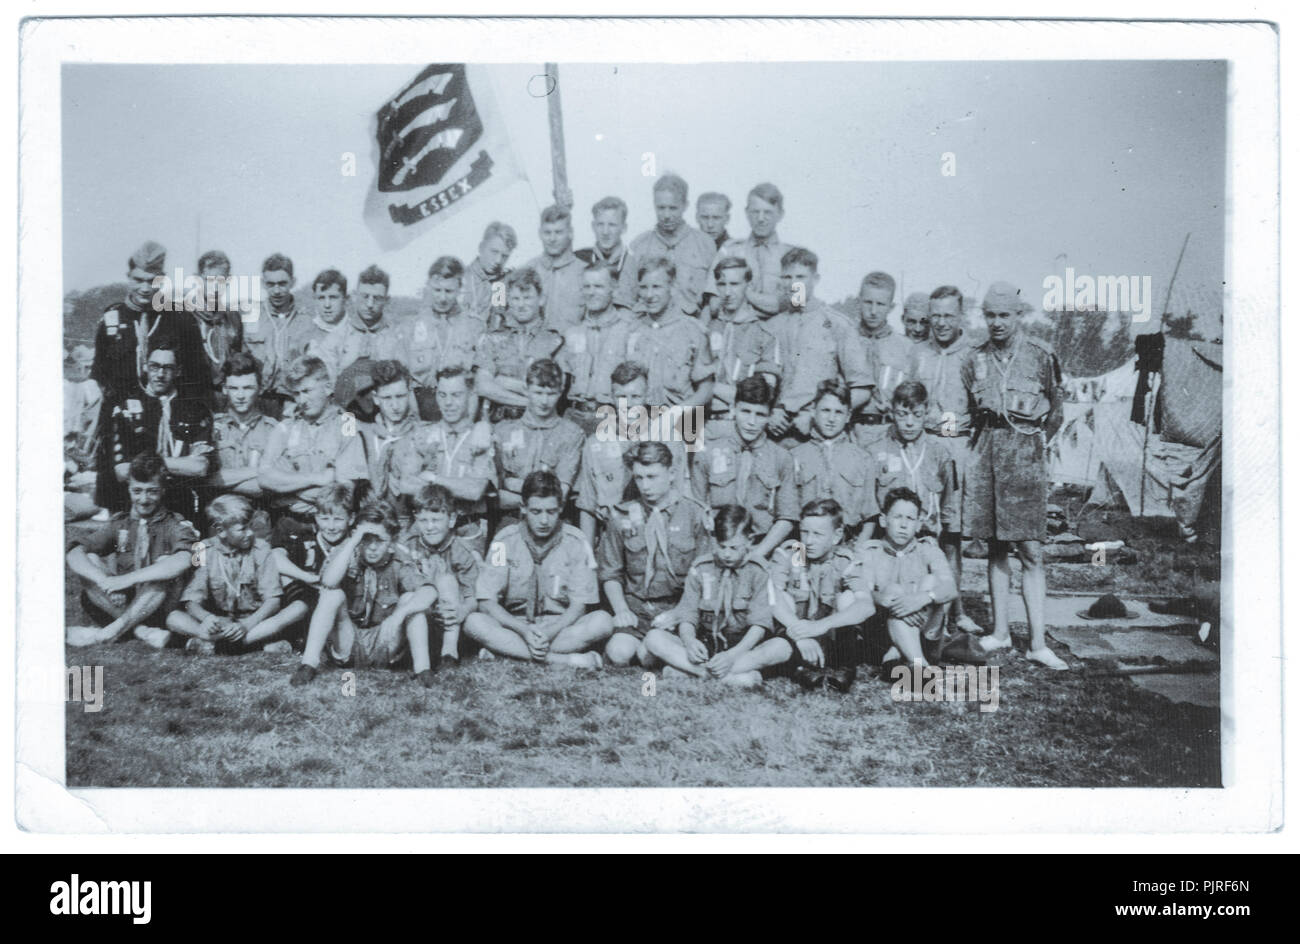 Essex tropa scout en el 5º Jamboree Scout Mundial, celebrada en Bloemendaal Vogelenzang Holanda, Holanda,1937 Foto de stock